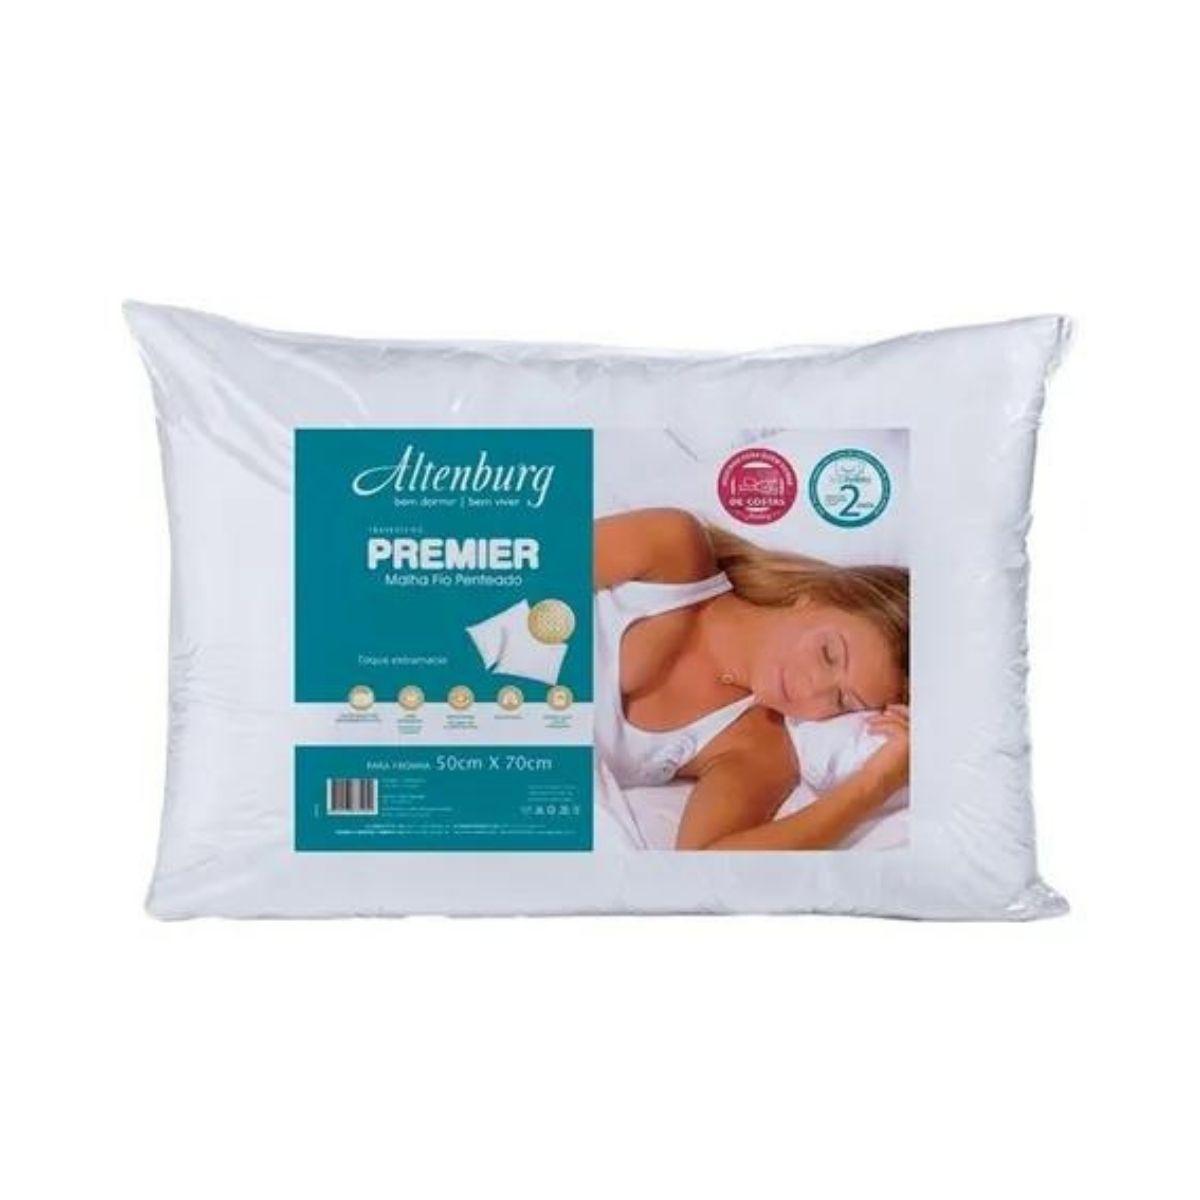 Travesseiro Premier 50 x 70 cm